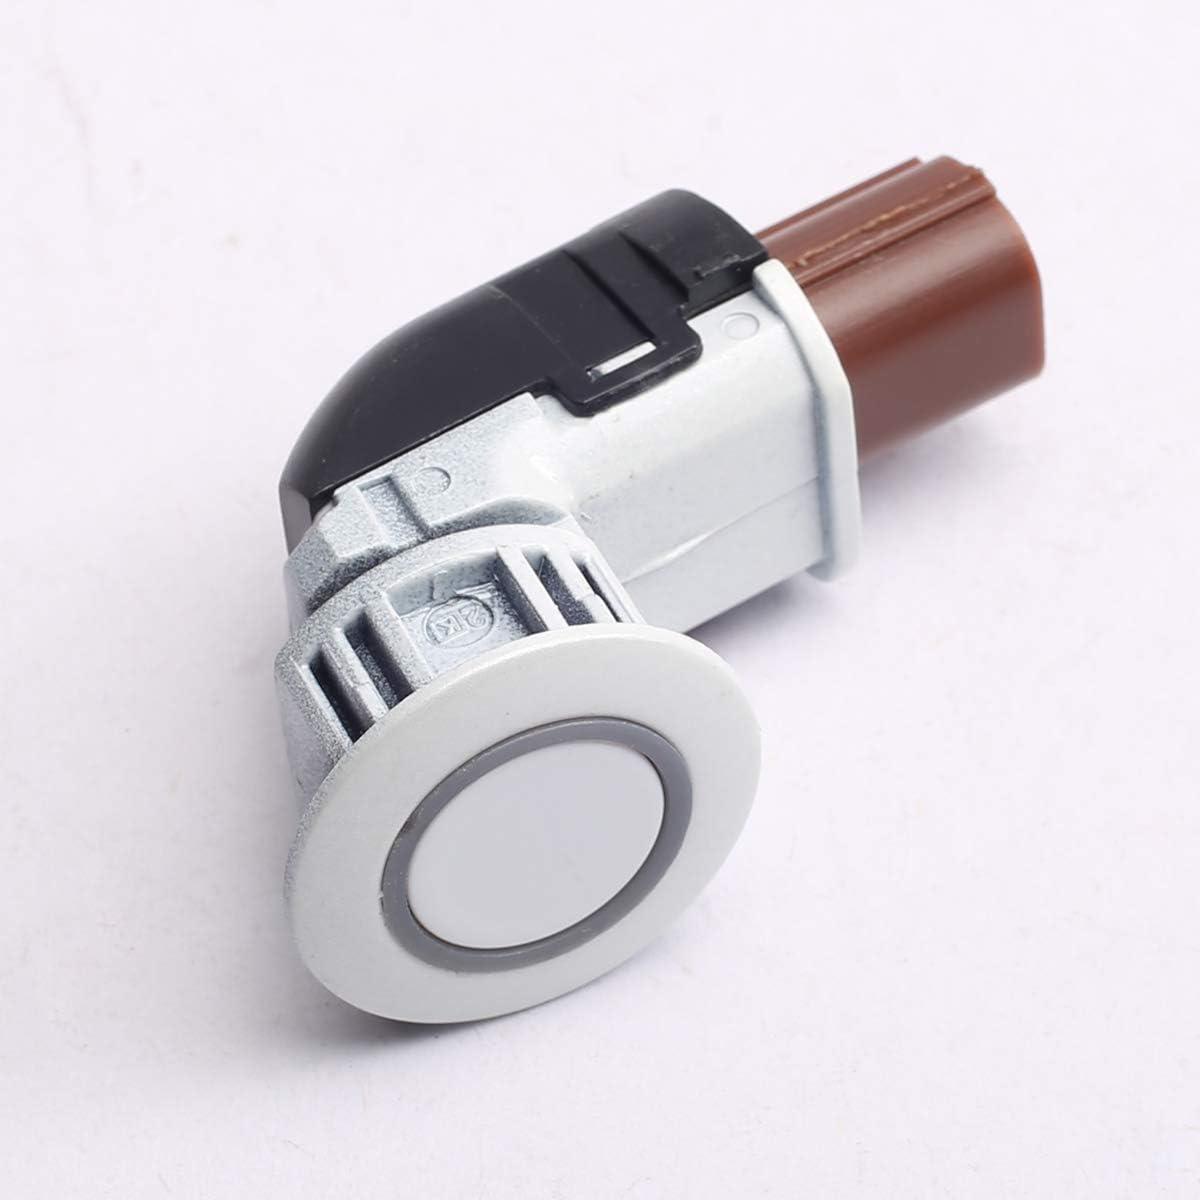 PeakCar 39680-SHJ-A61 PDC Parking Assist Sensor 39680-SHJ-A61-A0 Replacement for 2005-2010 Honda Odyssey 2004-2013 CRV White